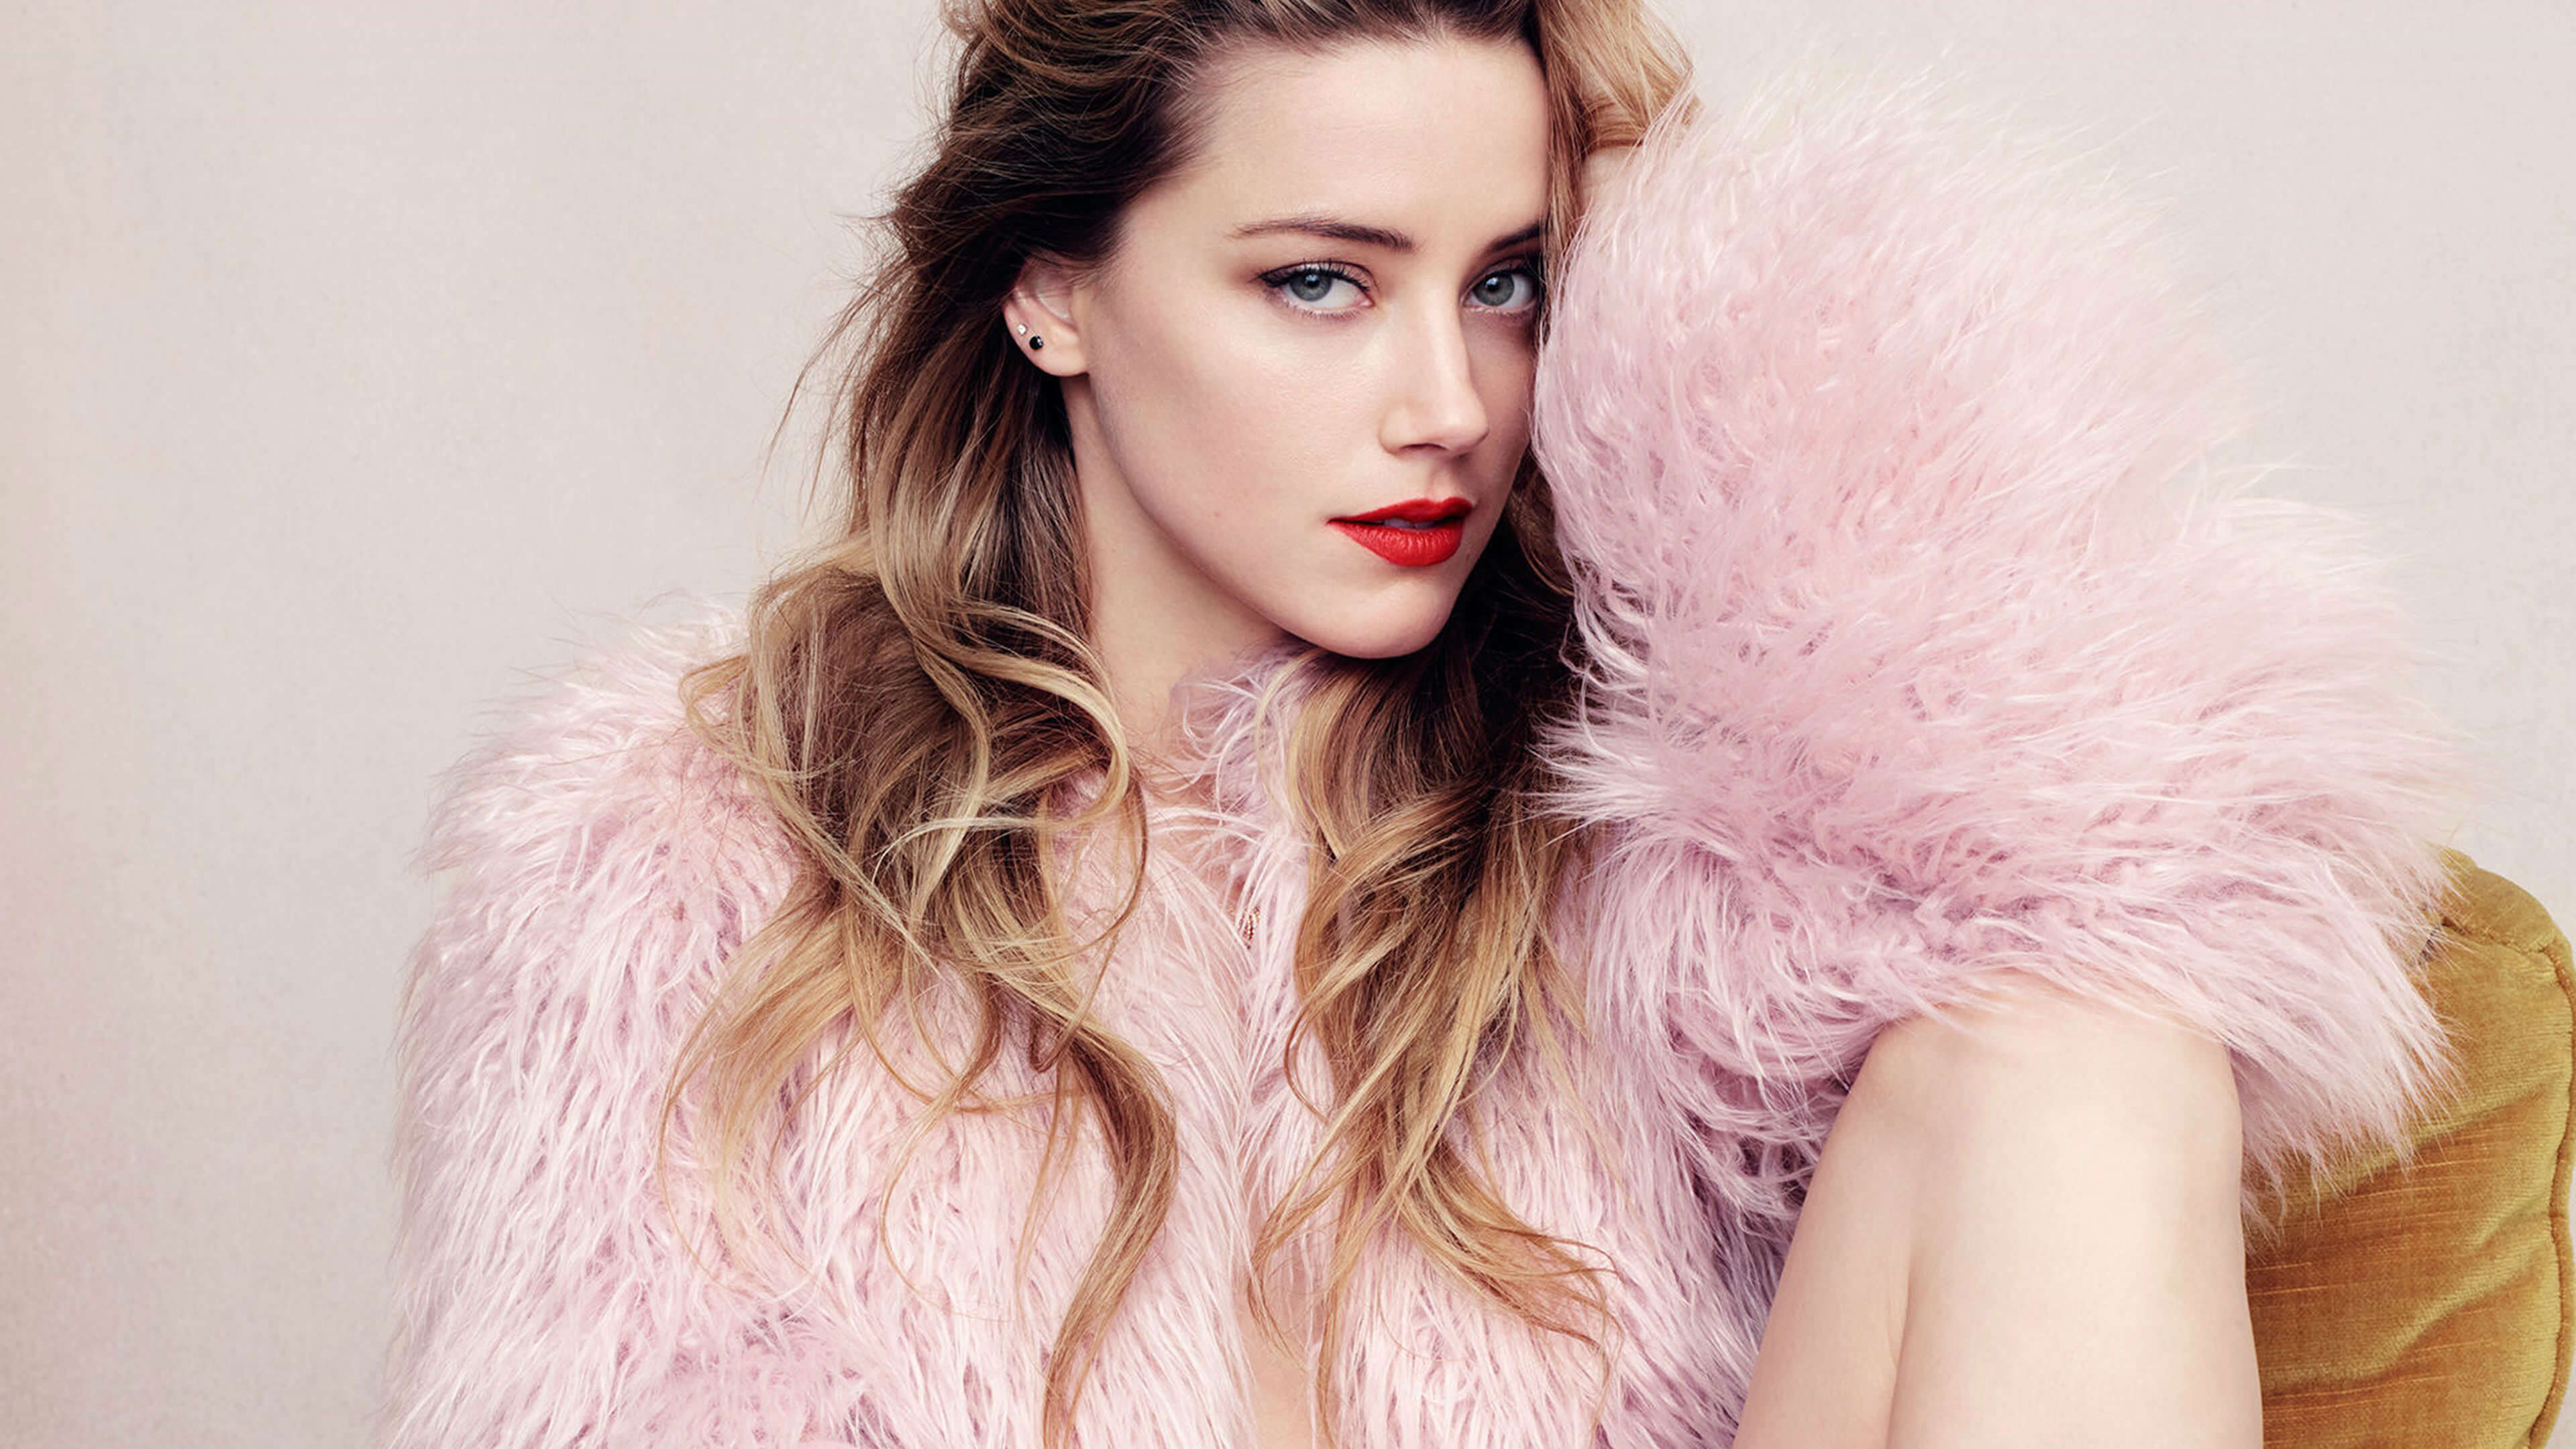 amber heard 6 1536857318 - Amber Heard 6 - hd-wallpapers, girls wallpapers, celebrities wallpapers, amber heard wallpapers